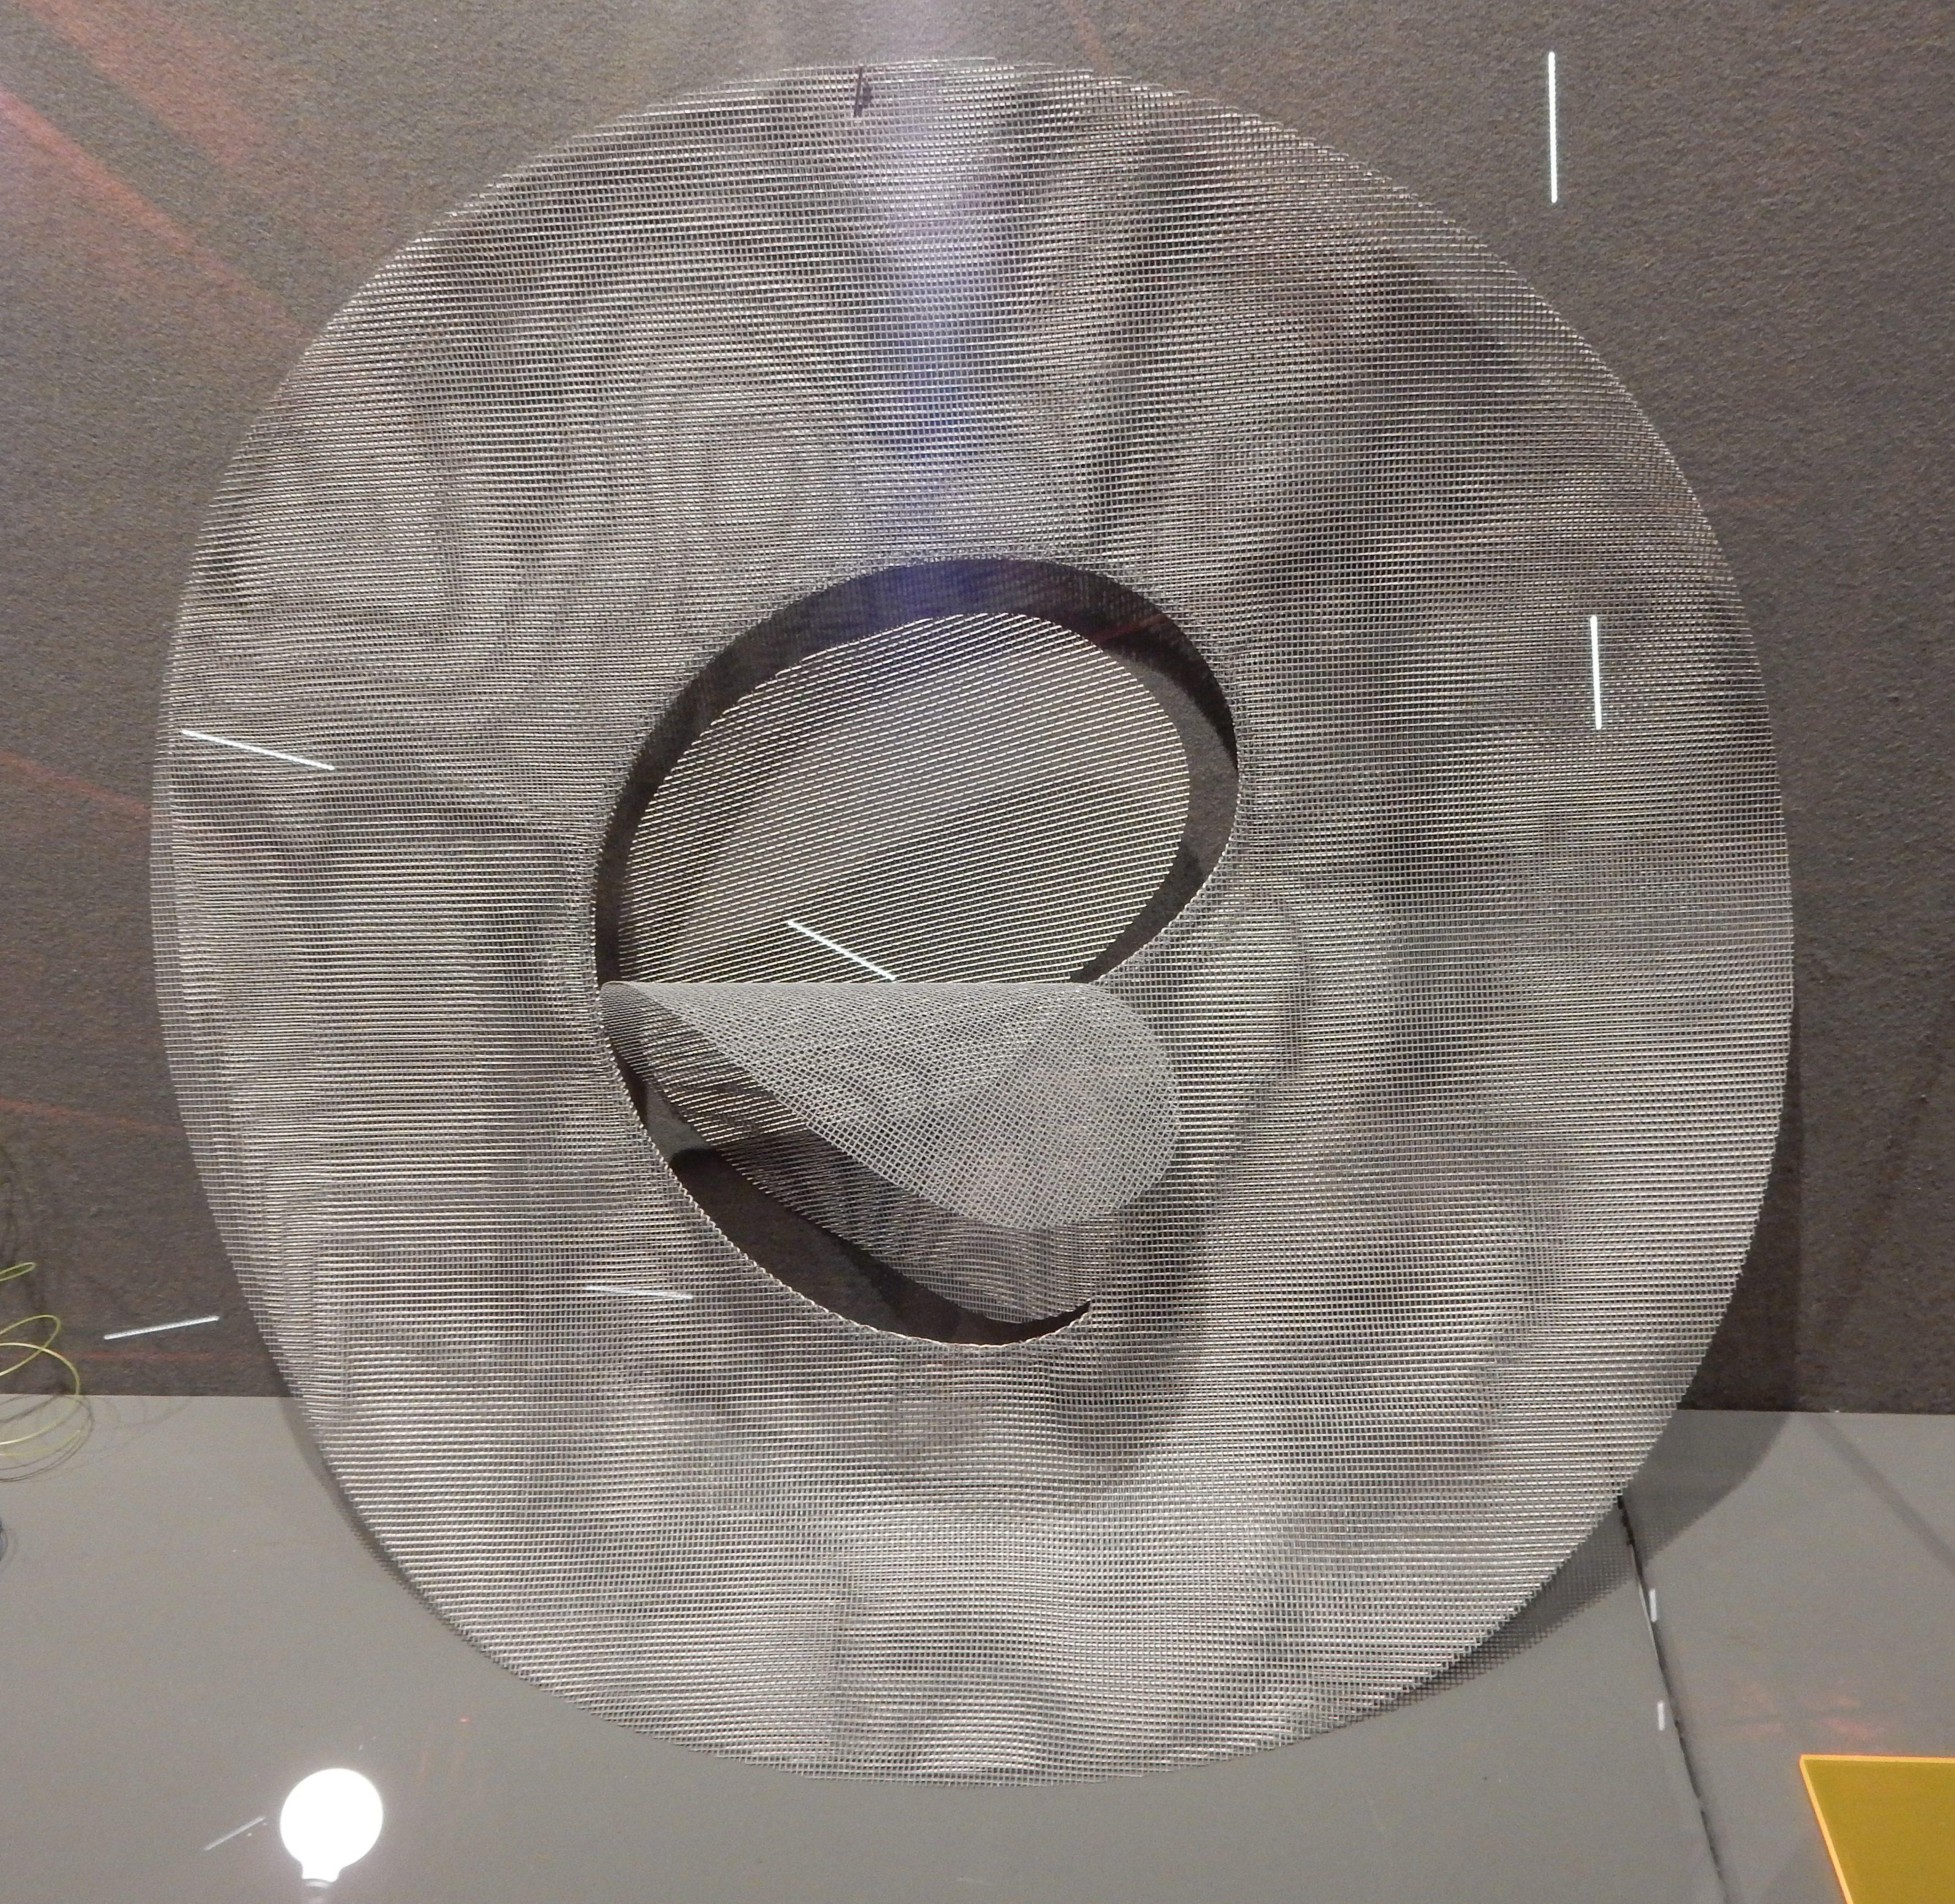 Susanna Heron, Floppy disc mesh, halssieraad, 1981. Collectie Jerven Ober, SAF 2018. Foto Esther Doornbusch, november 2018, CC BY 4.0